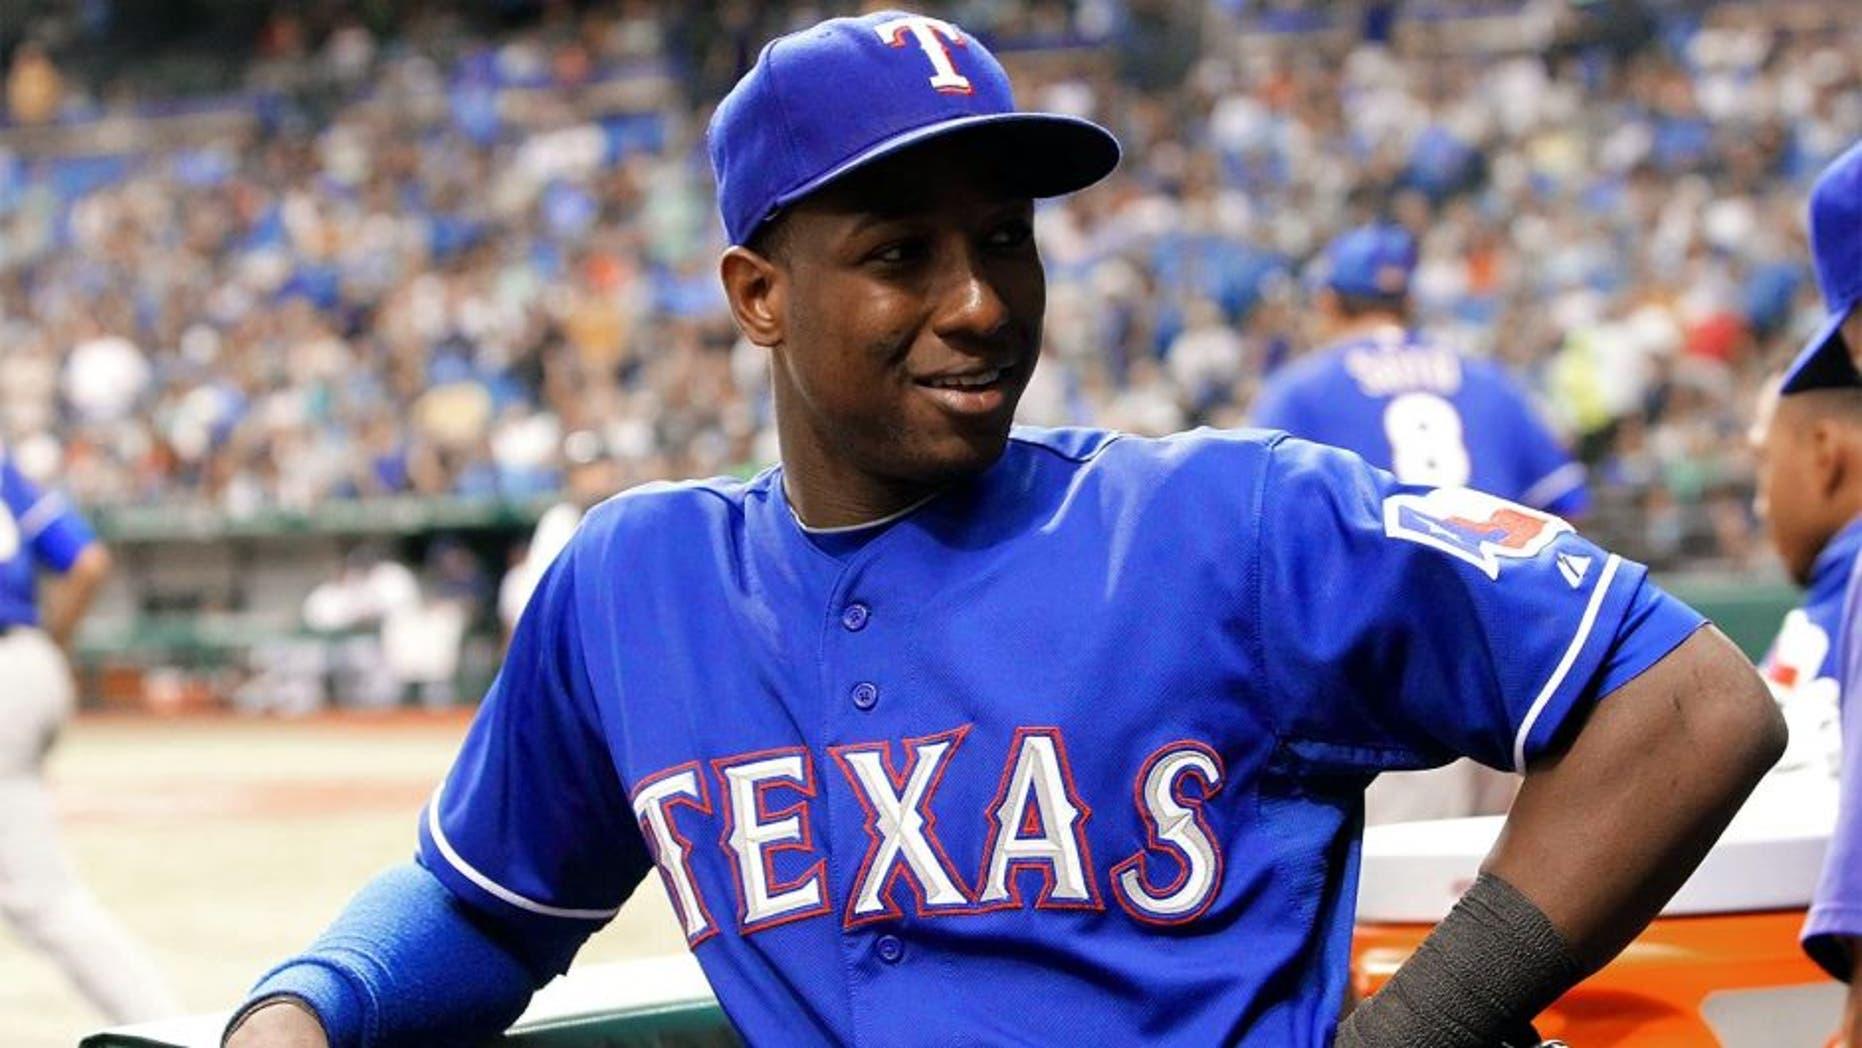 Sep 18, 2013; St. Petersburg, FL, USA; Texas Rangers second baseman Jurickson Profar (13) against the Tampa Bay Rays at Tropicana Field. Mandatory Credit: Kim Klement-USA TODAY Sports